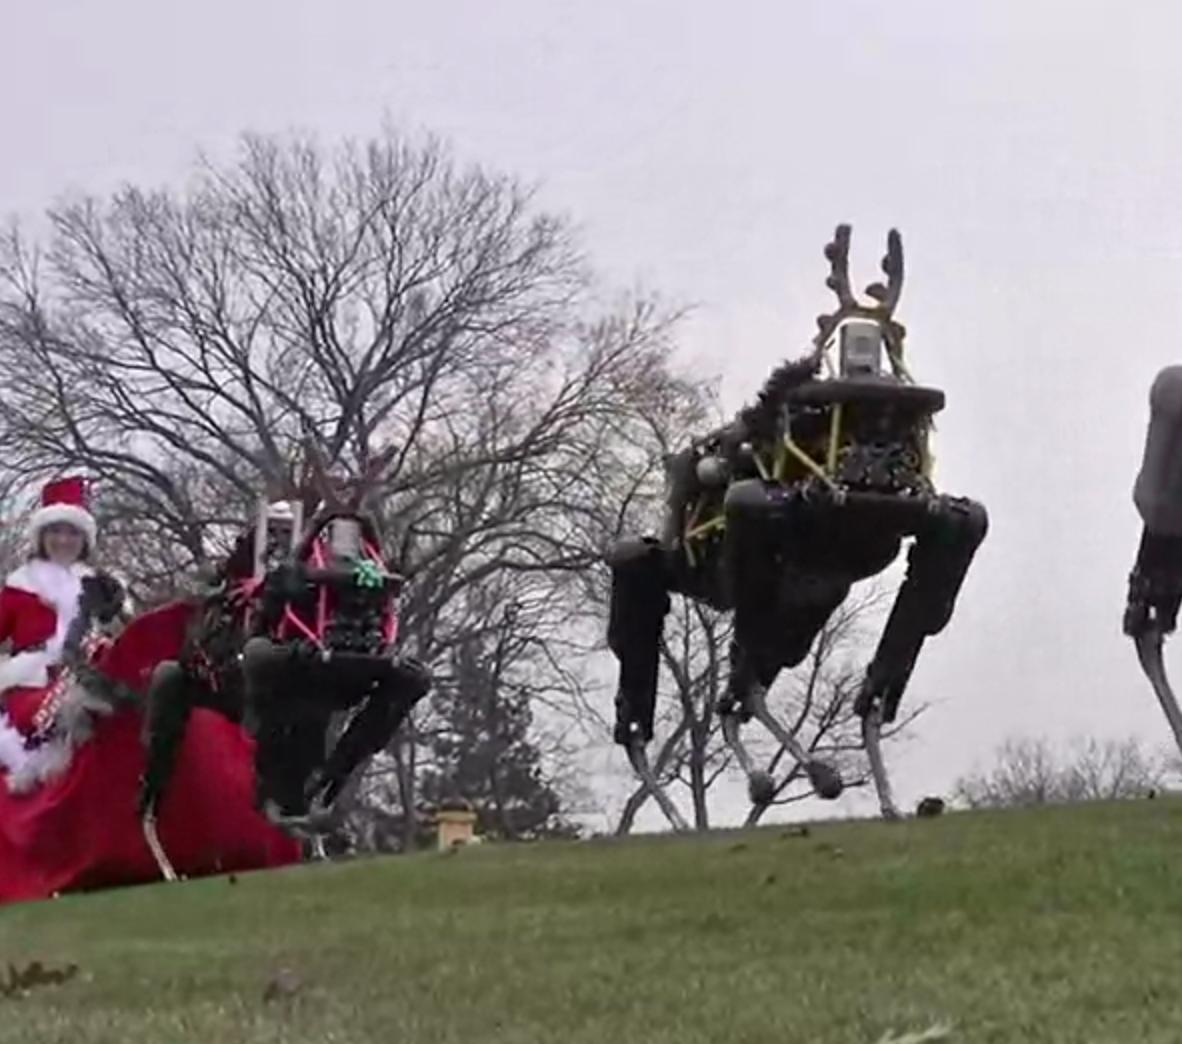 Boston Dynamics Robots Make Reindeer Obsolete